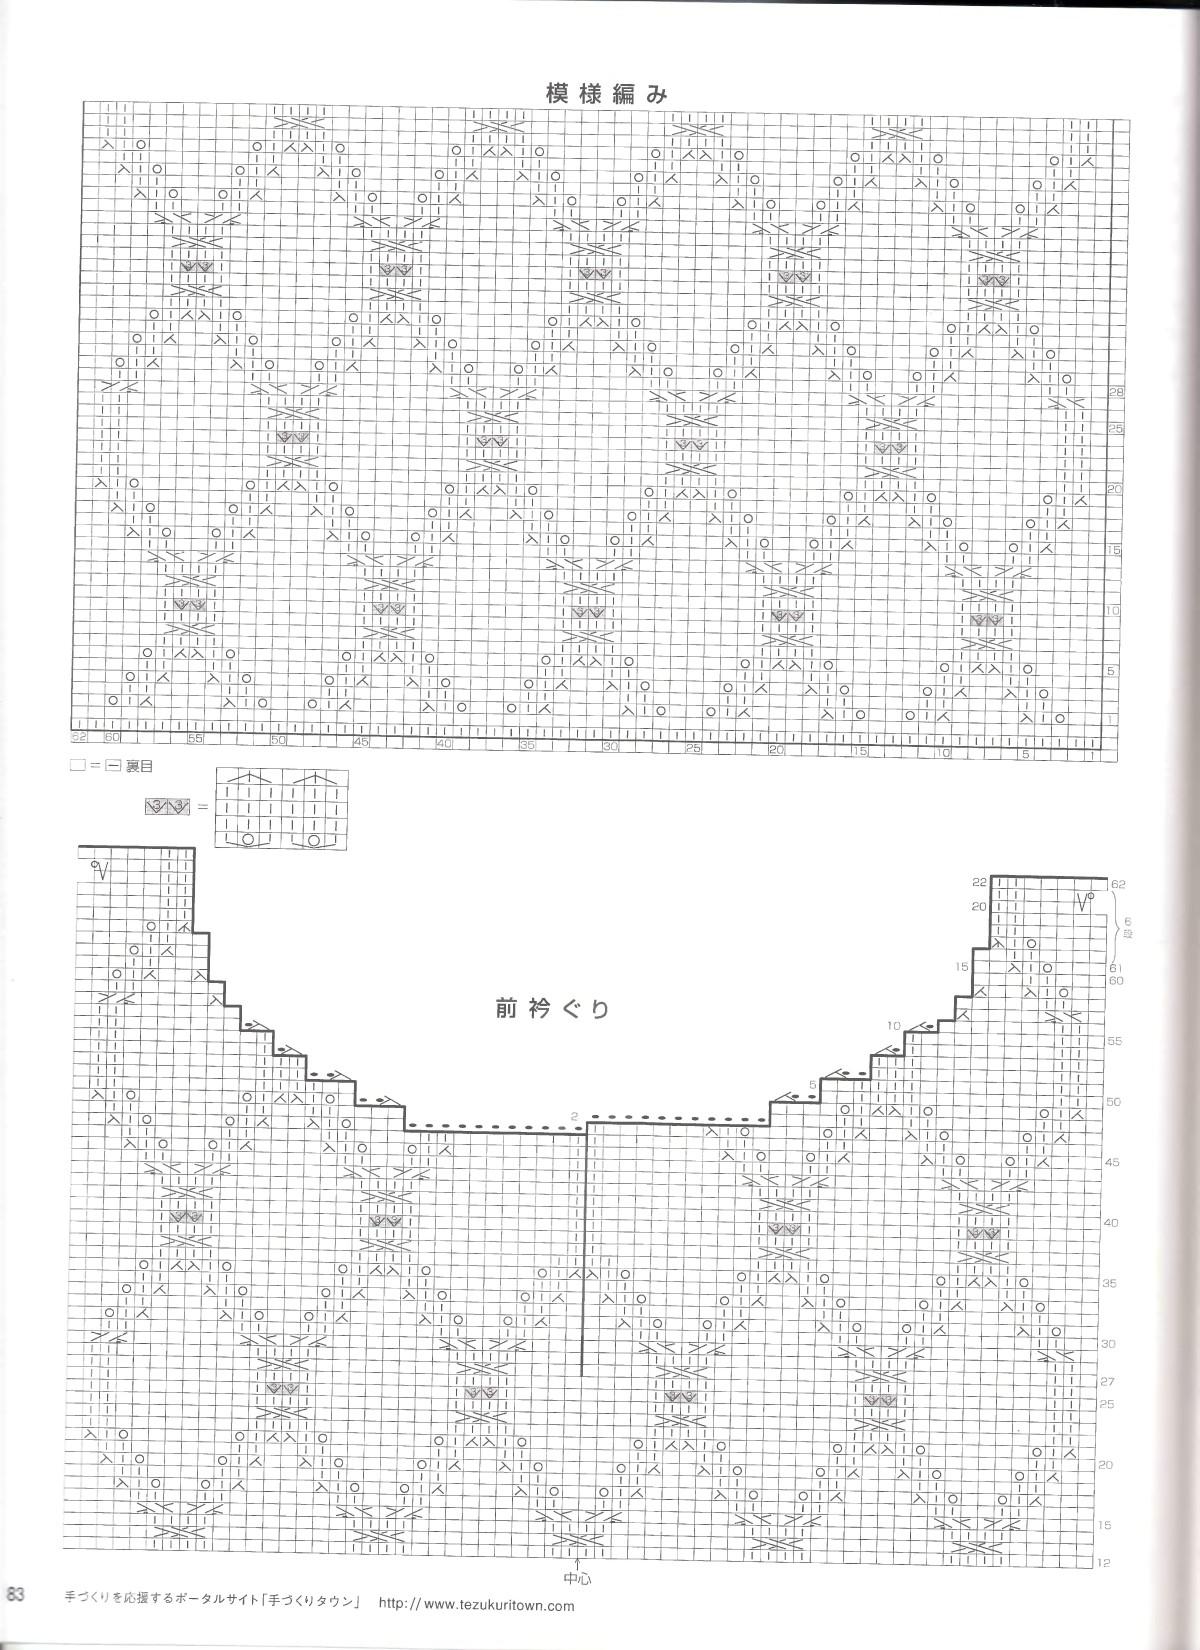 Lets-knit-series-NV4359-2008-Spring-Summer-sp-kr_81.jpg